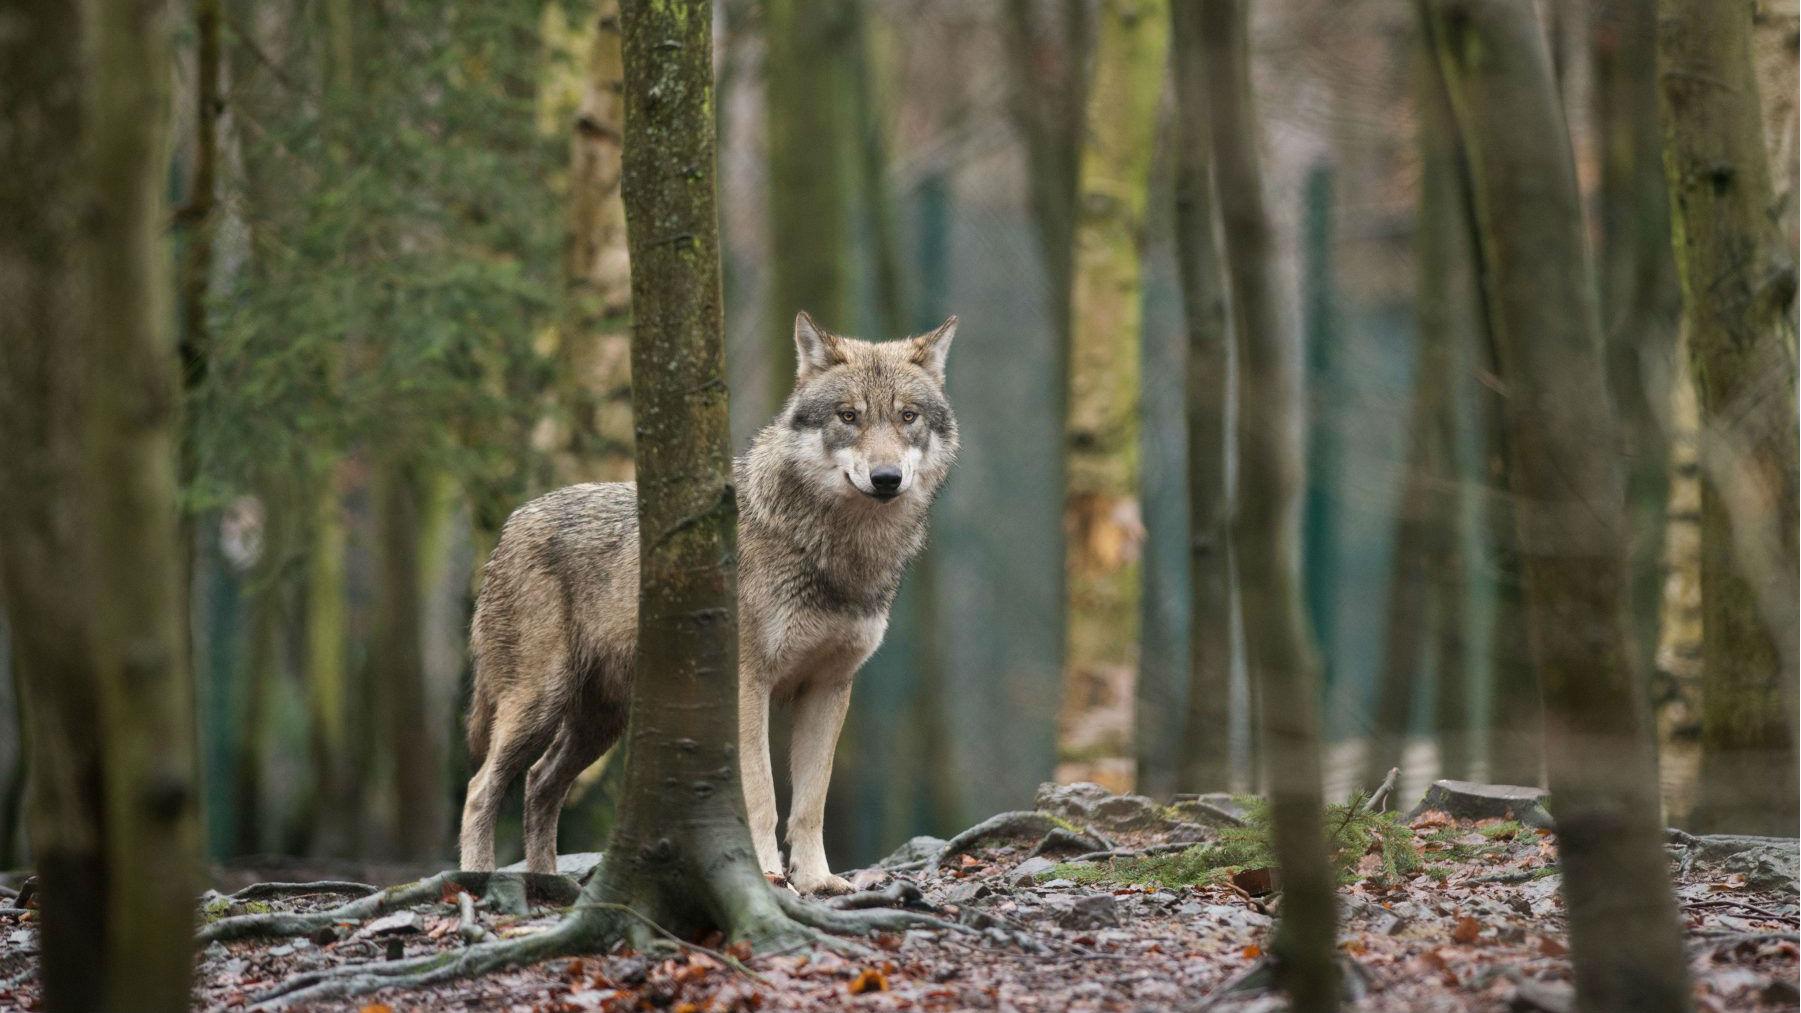 Sweden's wolf numbers slide, illegal hunting blamed